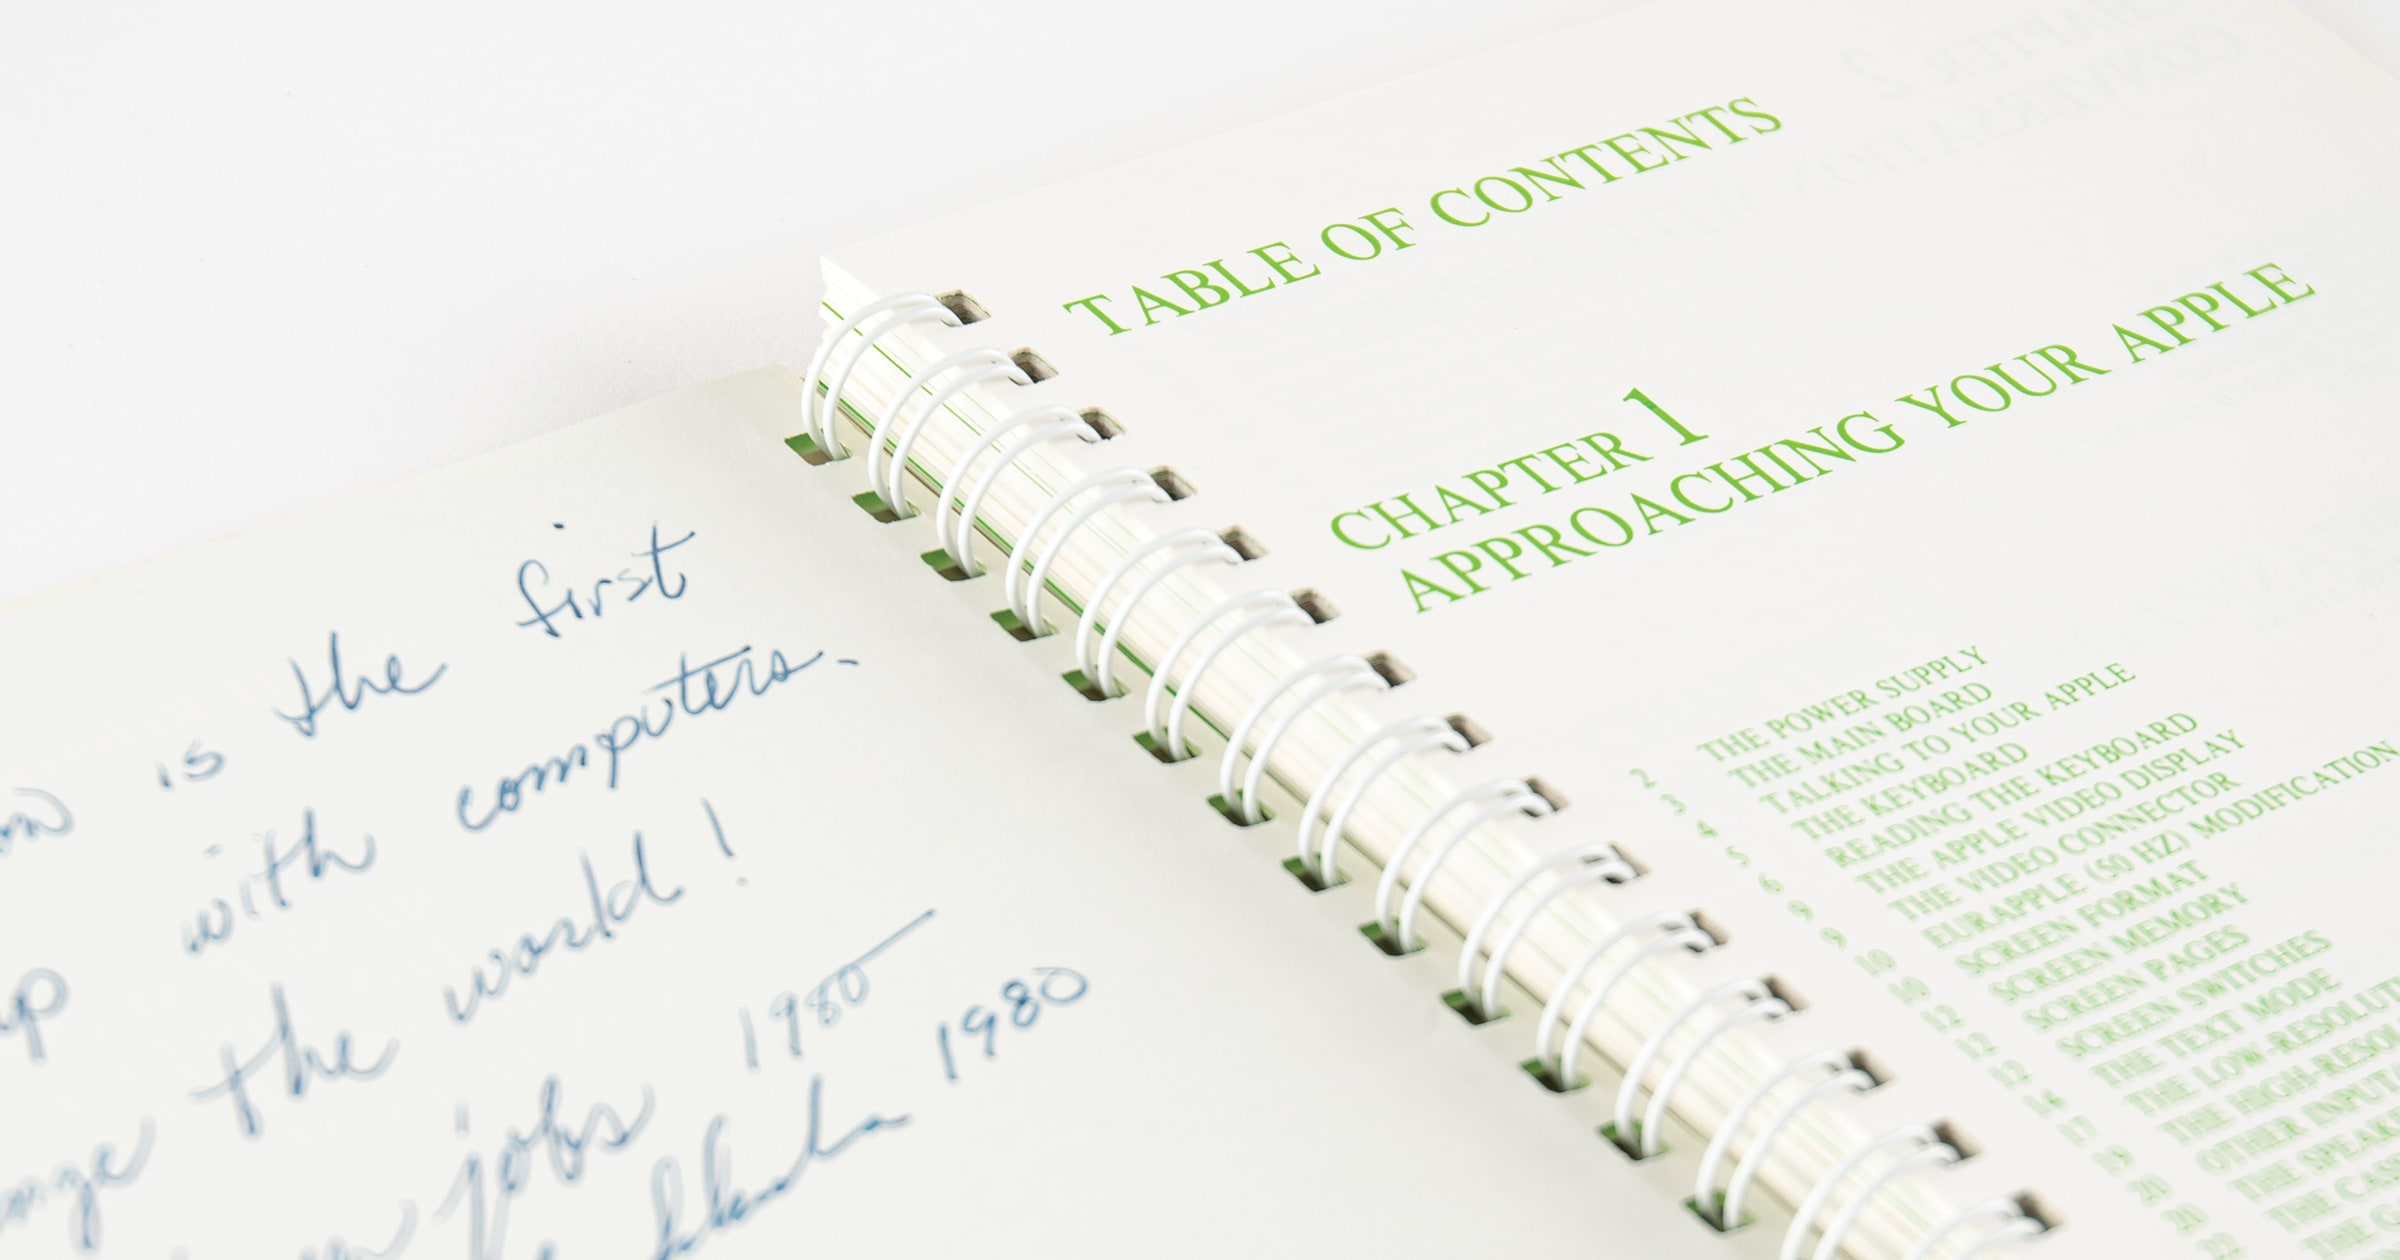 apple II manual signed by steve jobs